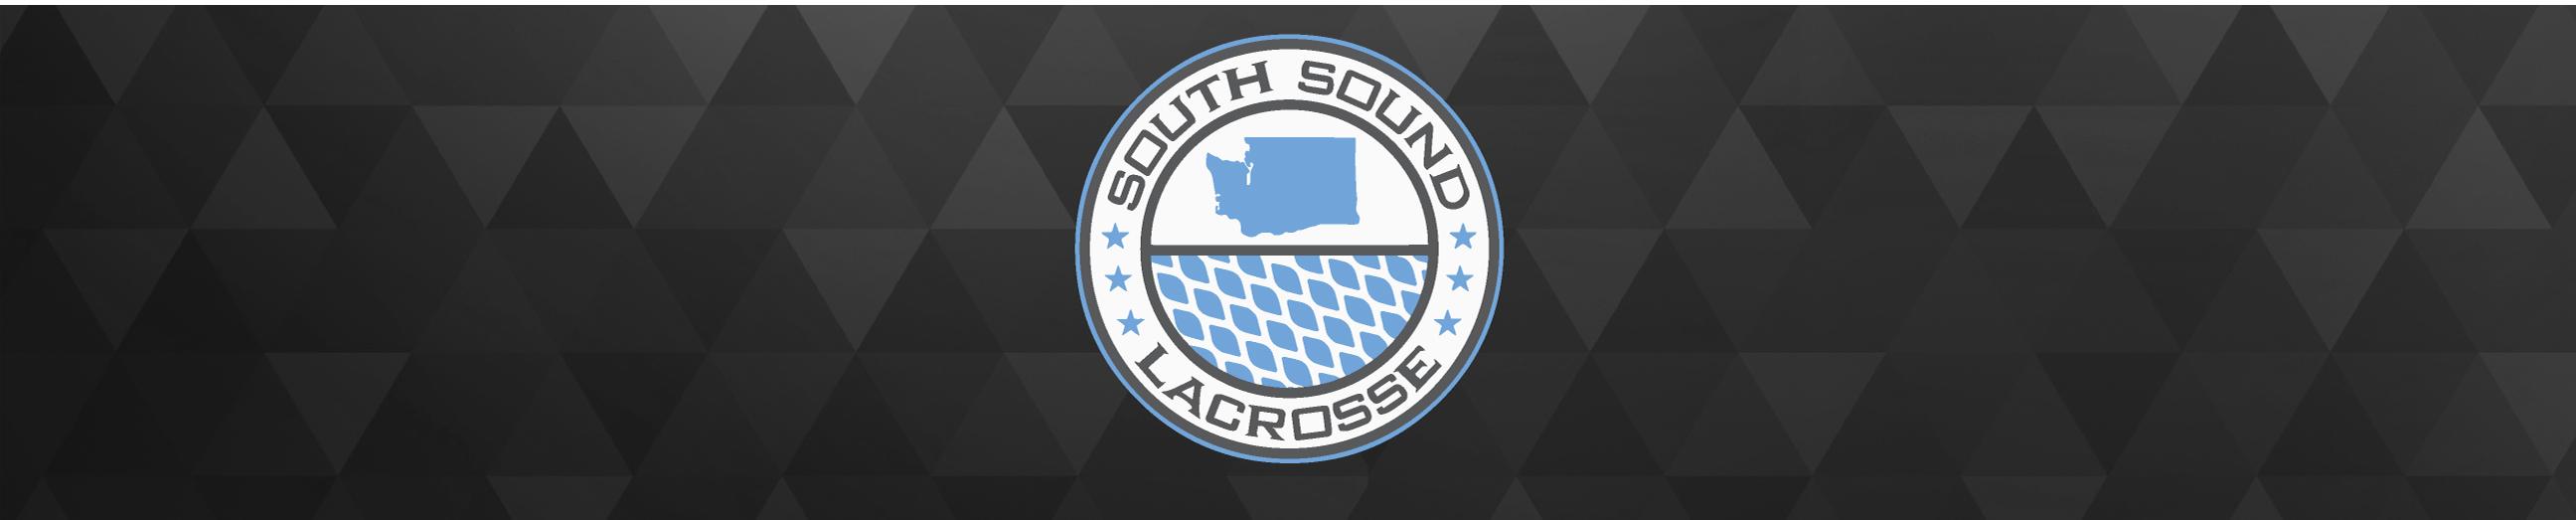 South Sound Lacrosse